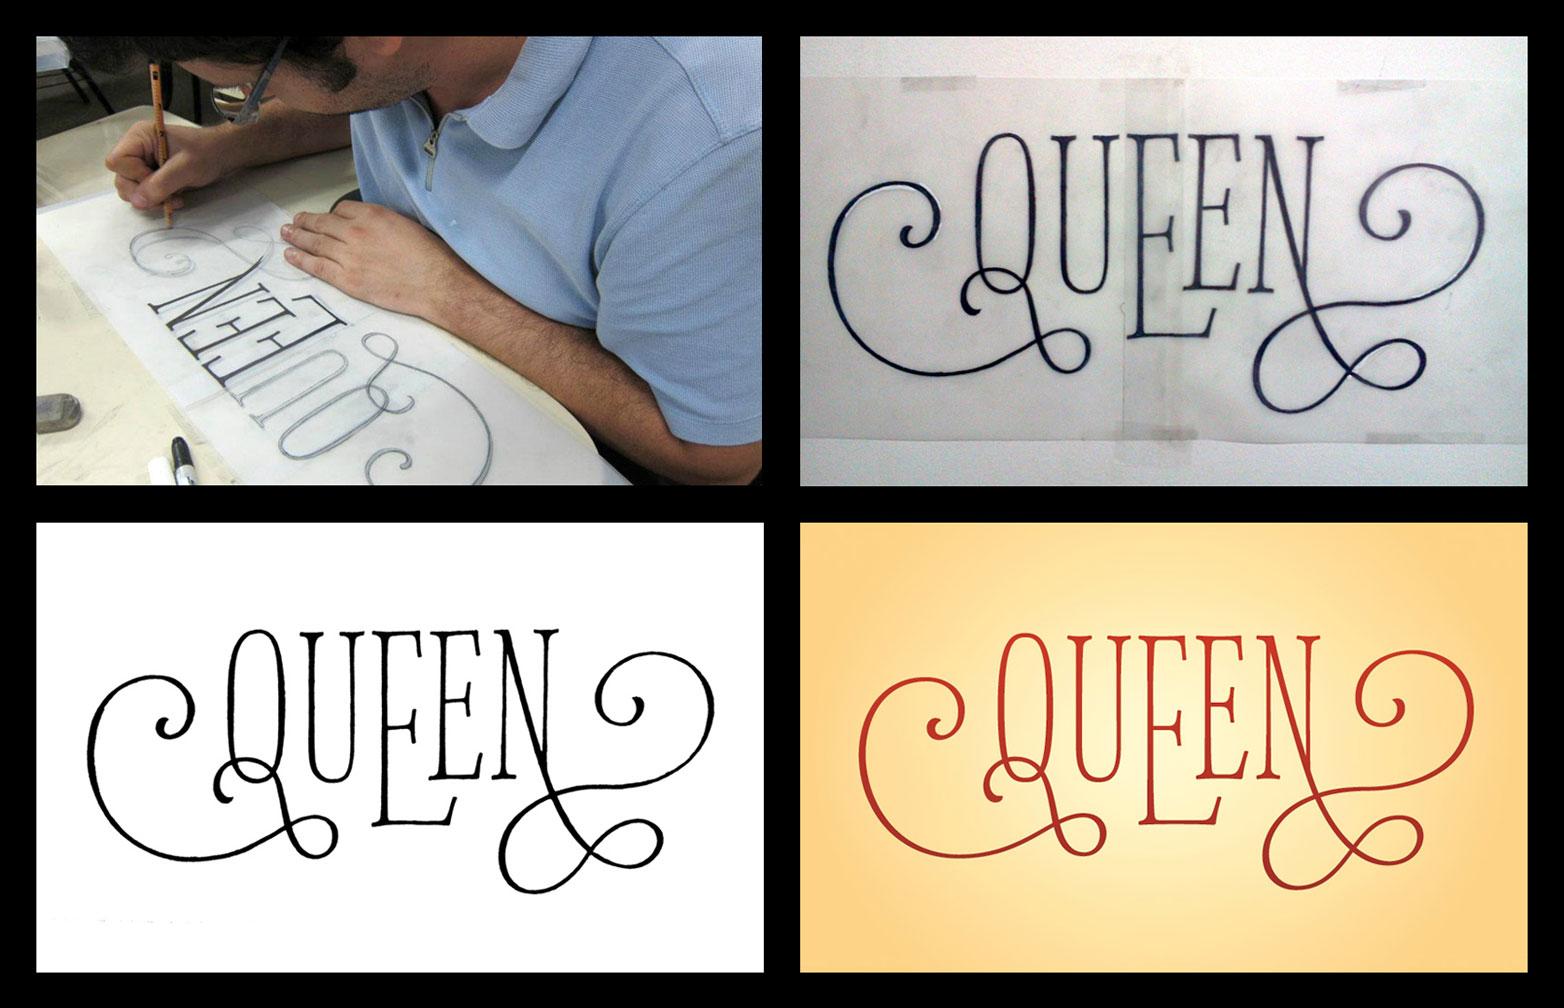 b-queen-gomes2